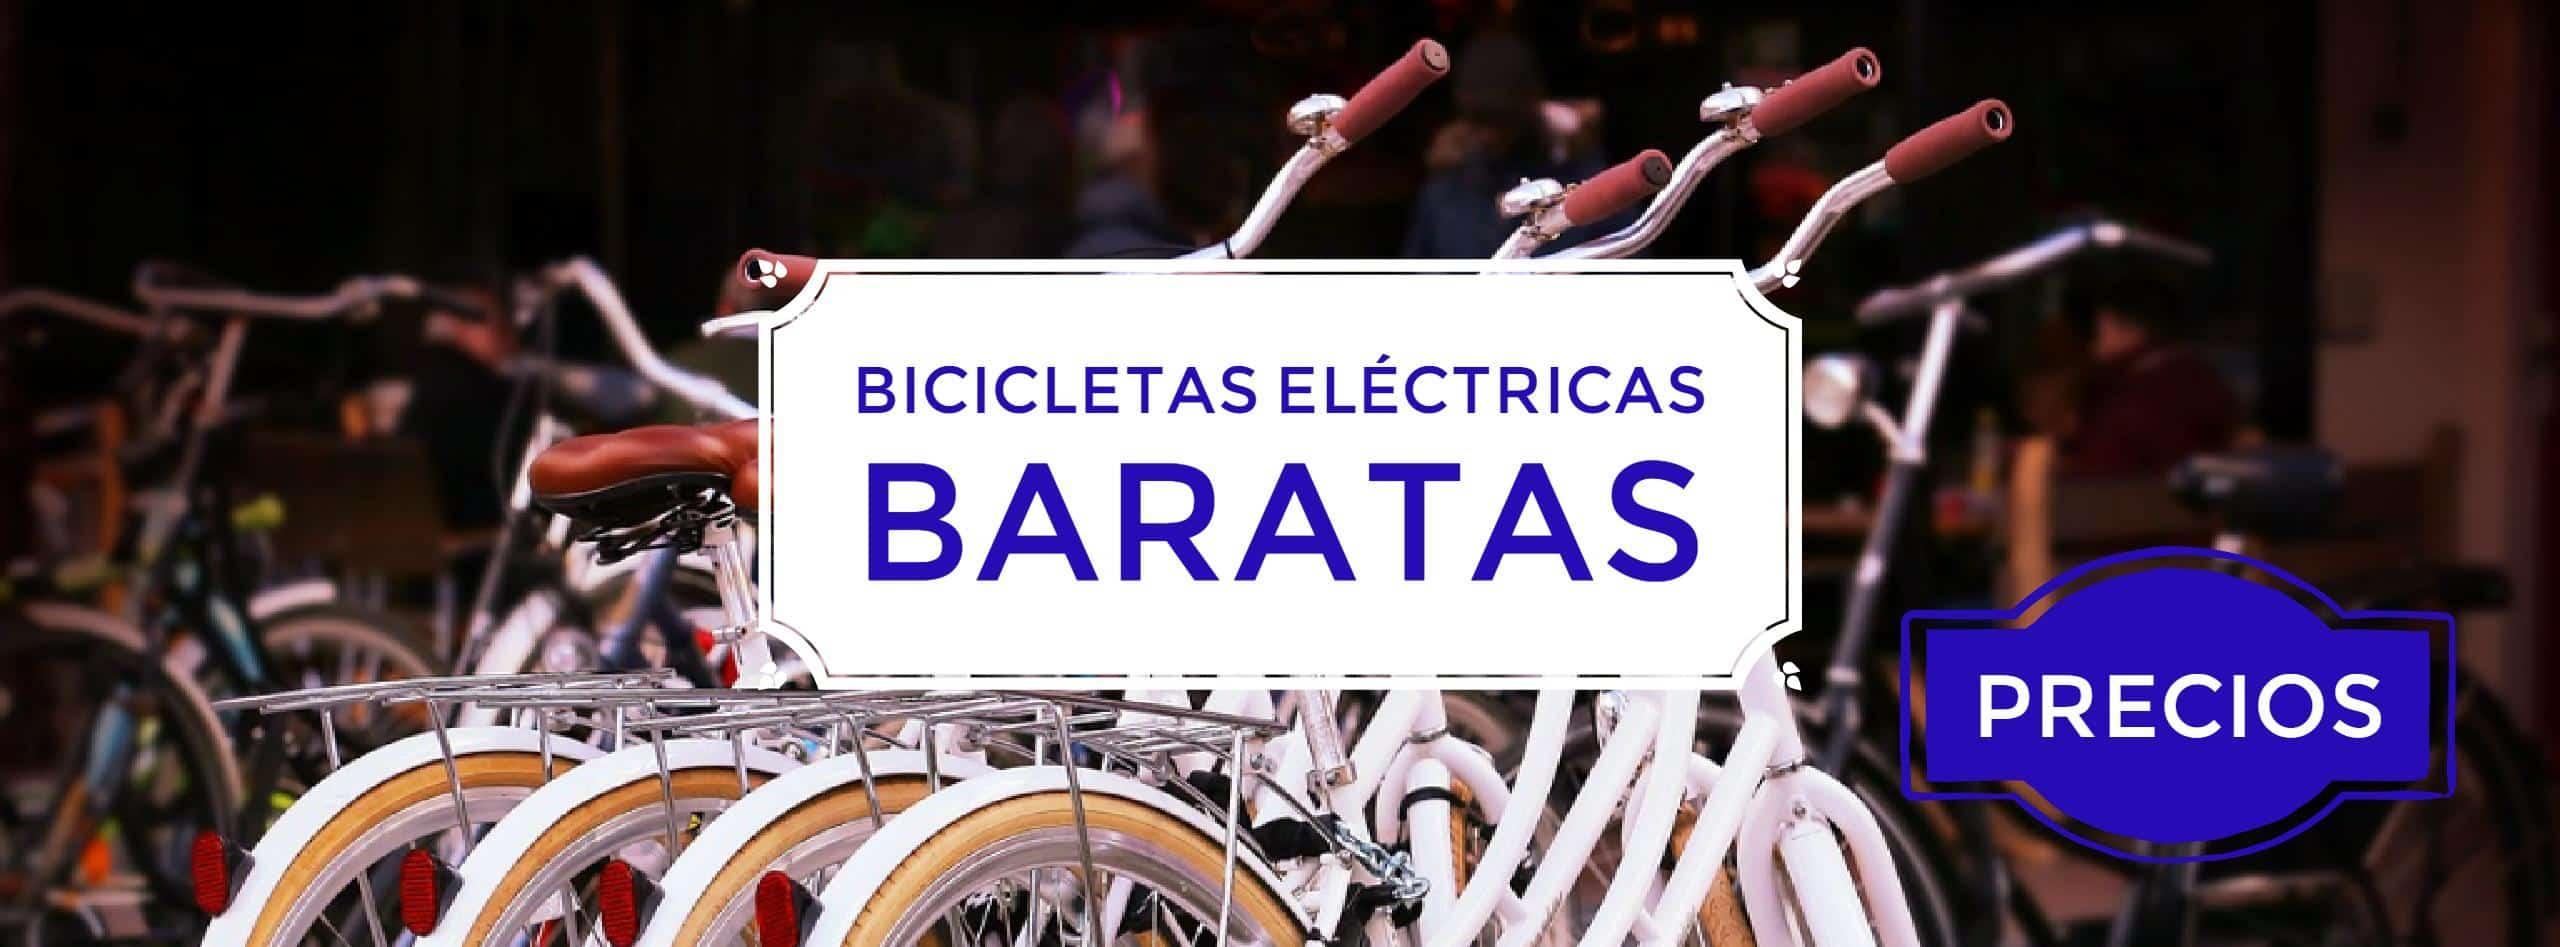 - Bicicletas eléctricas baratas